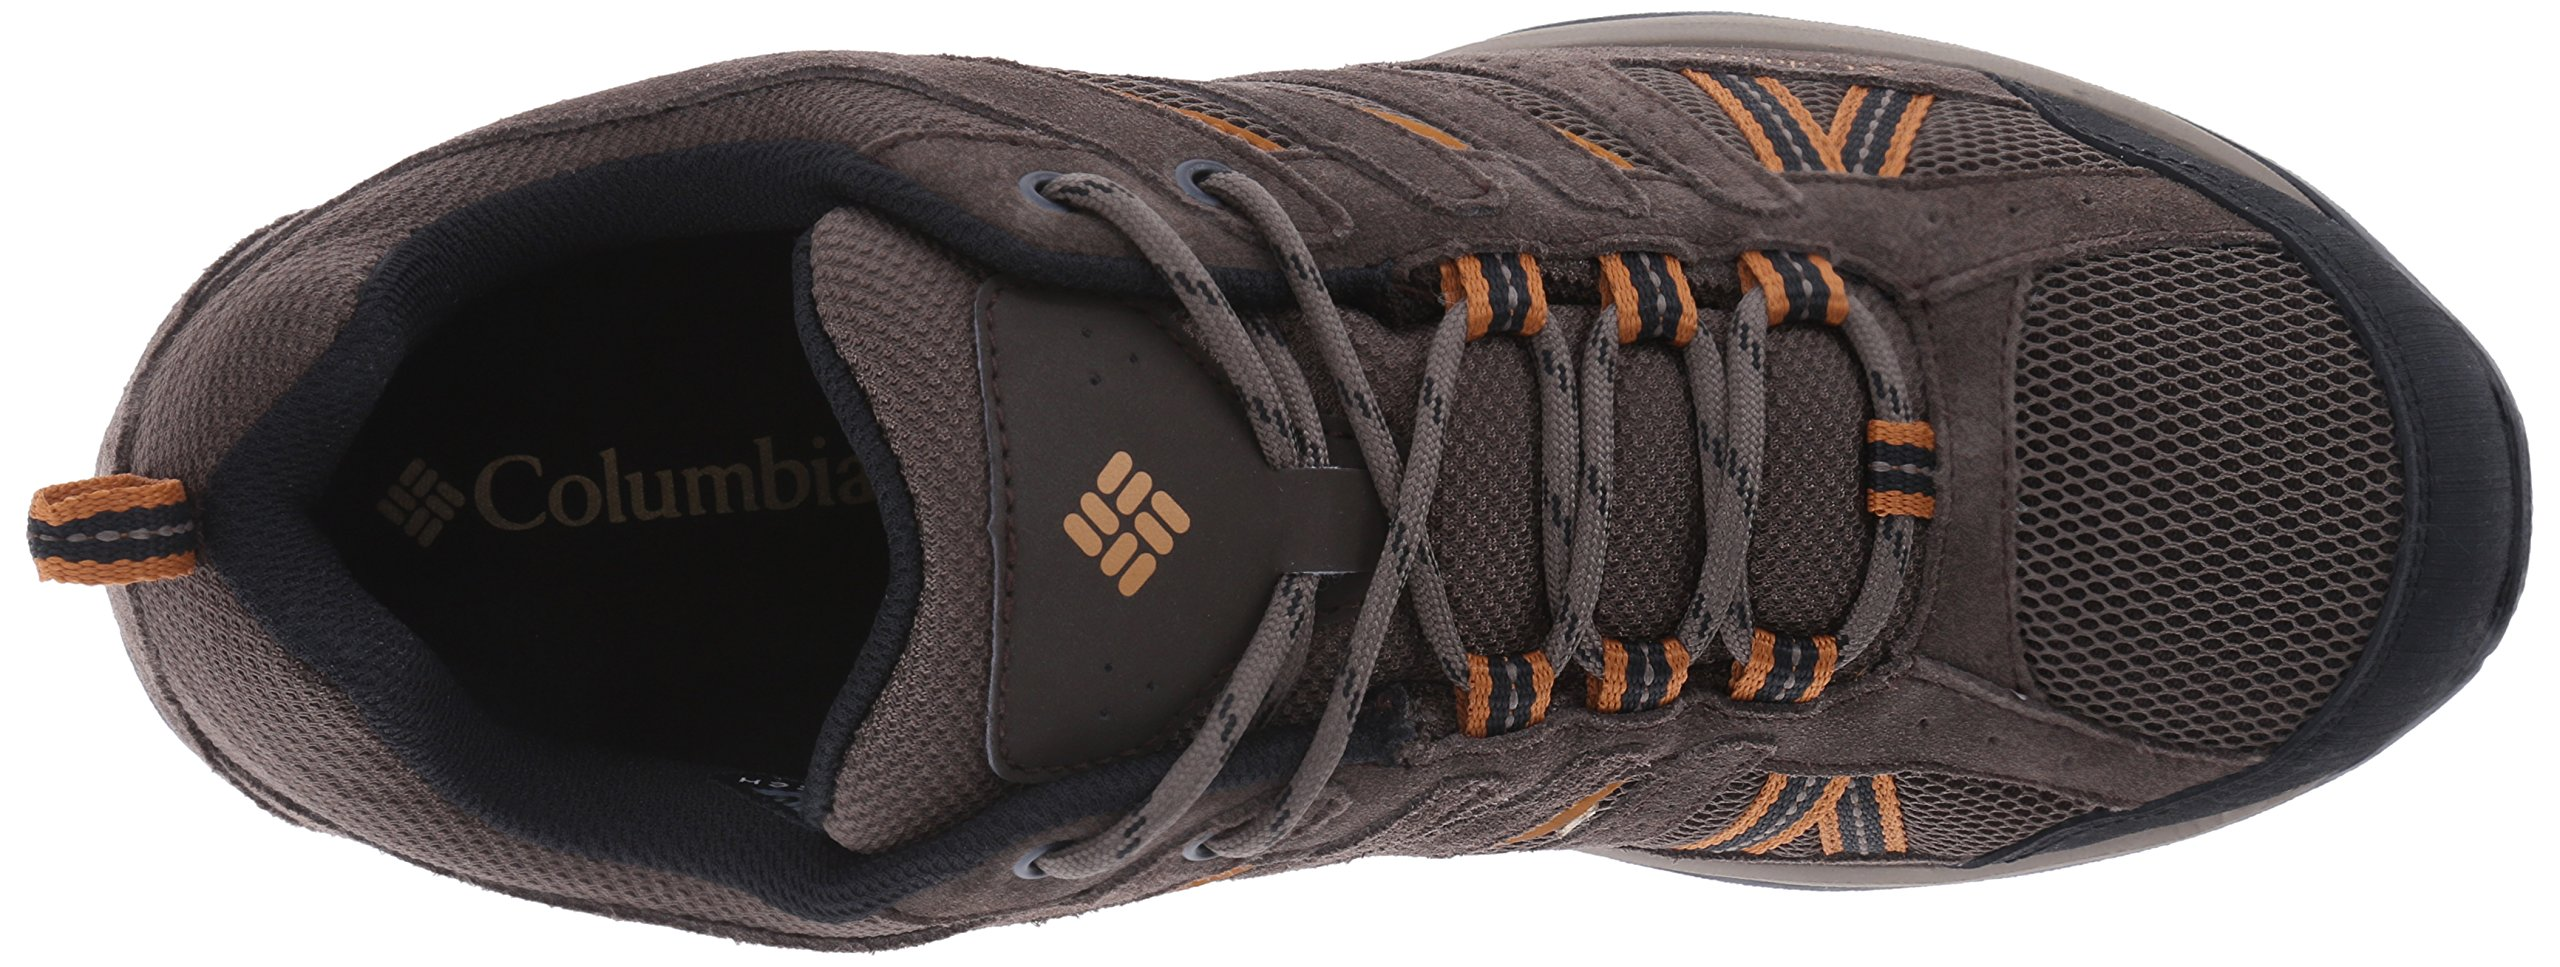 Columbia Men's North Plains Drifter Waterproof High Rise Hiking Boots